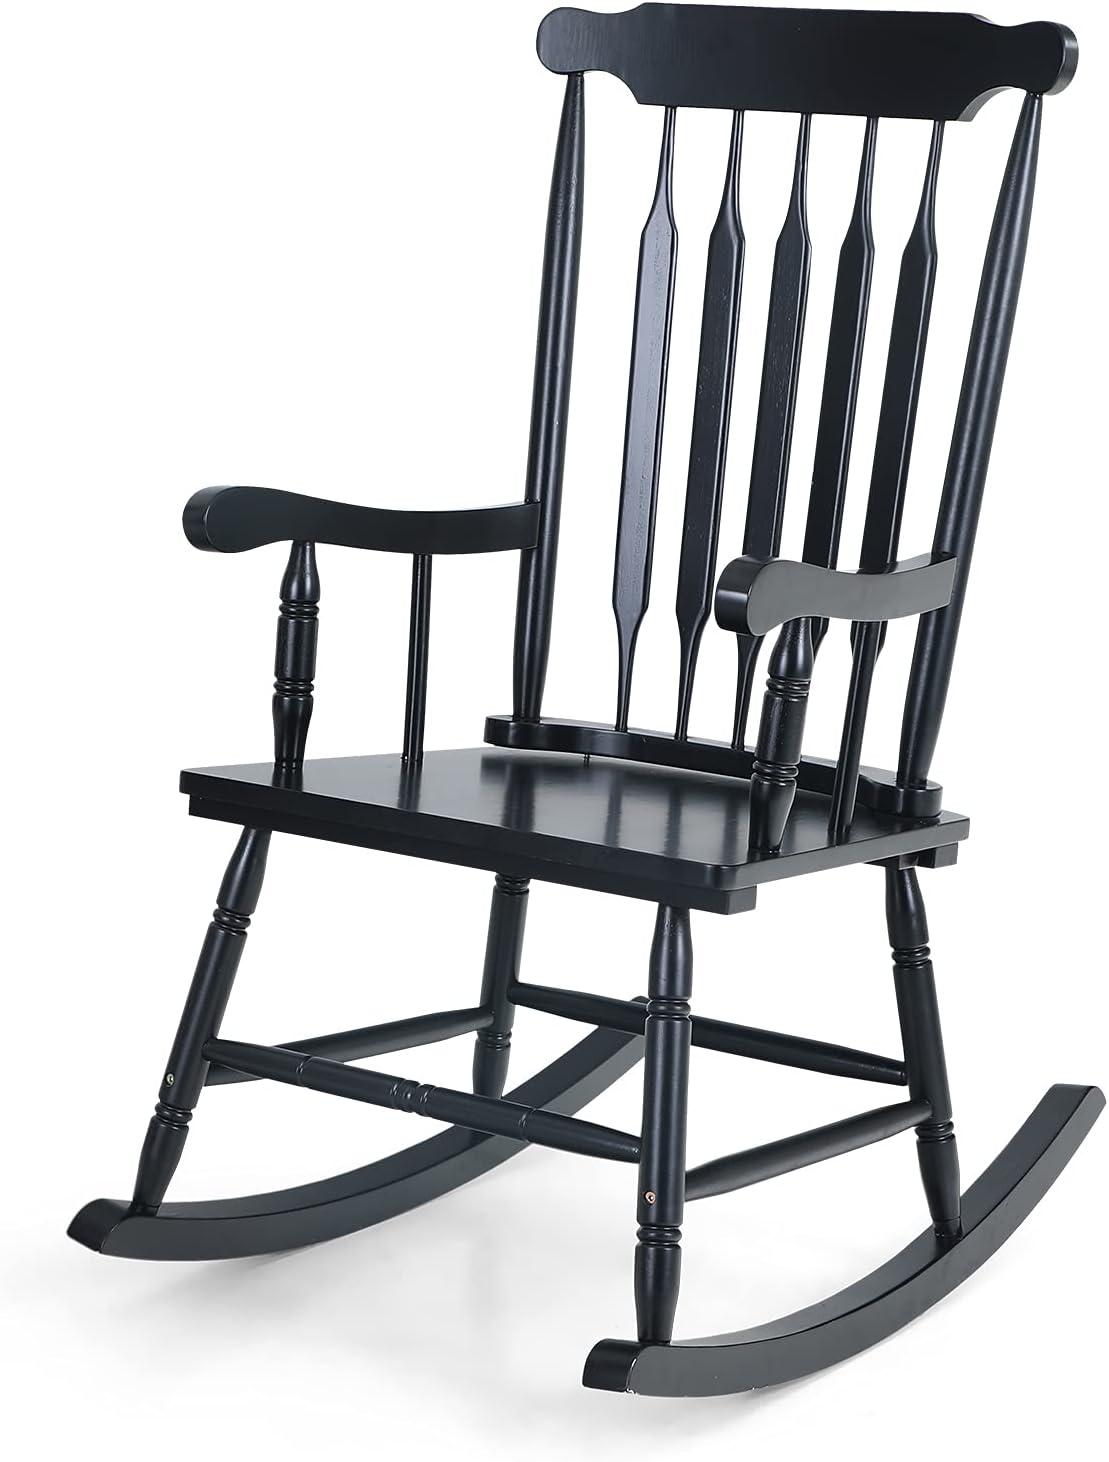 MFSTUDIO Patio Rocking Chair for IndoorOu Garden Max 81% OFF Time sale Porch Backyard